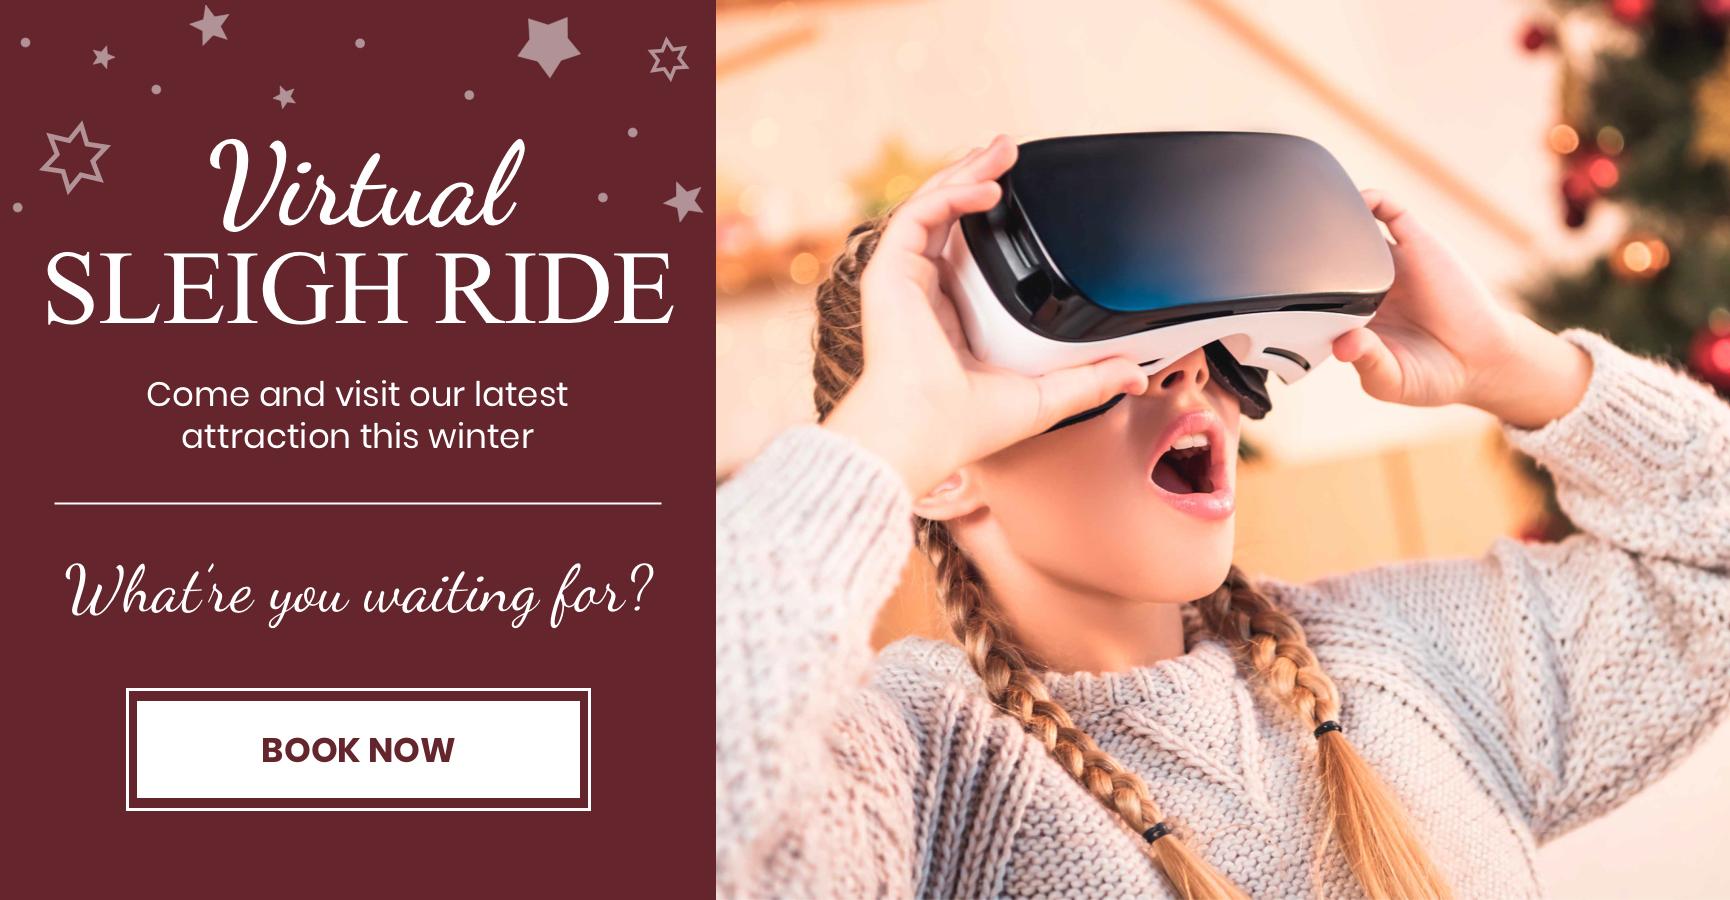 Virtual Reality Sleigh Ride - Book Now